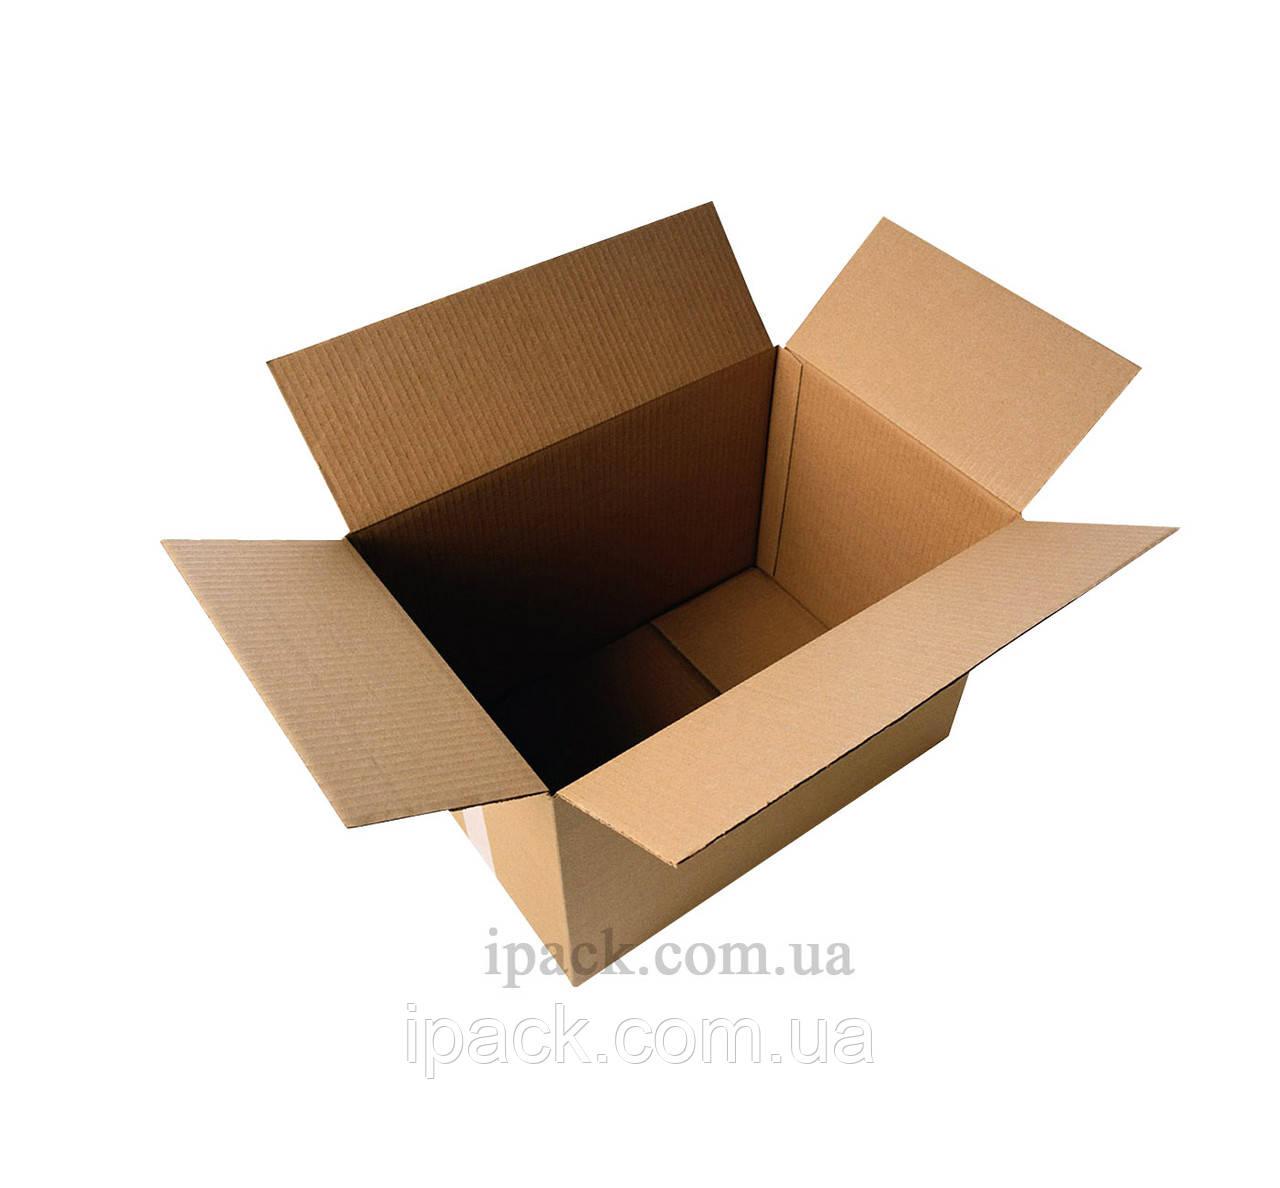 Гофроящик 345*175*270 мм, бурый, четырехклапанный картонный короб